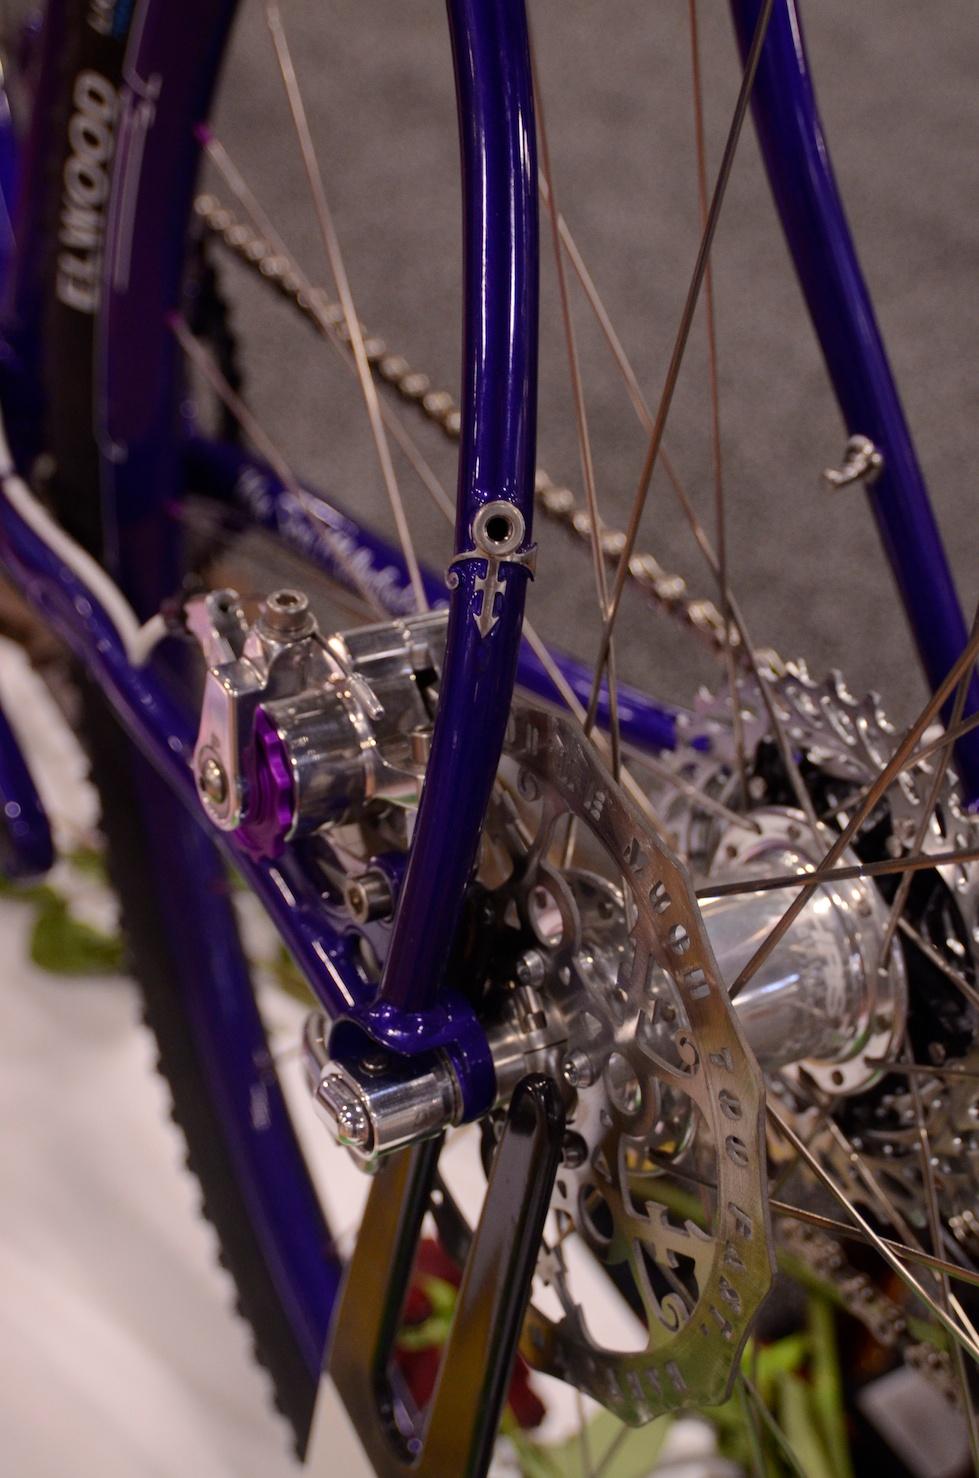 WEB-Princebike-Purple-reign-nahbs-2017-peacock-groove 12.jpg